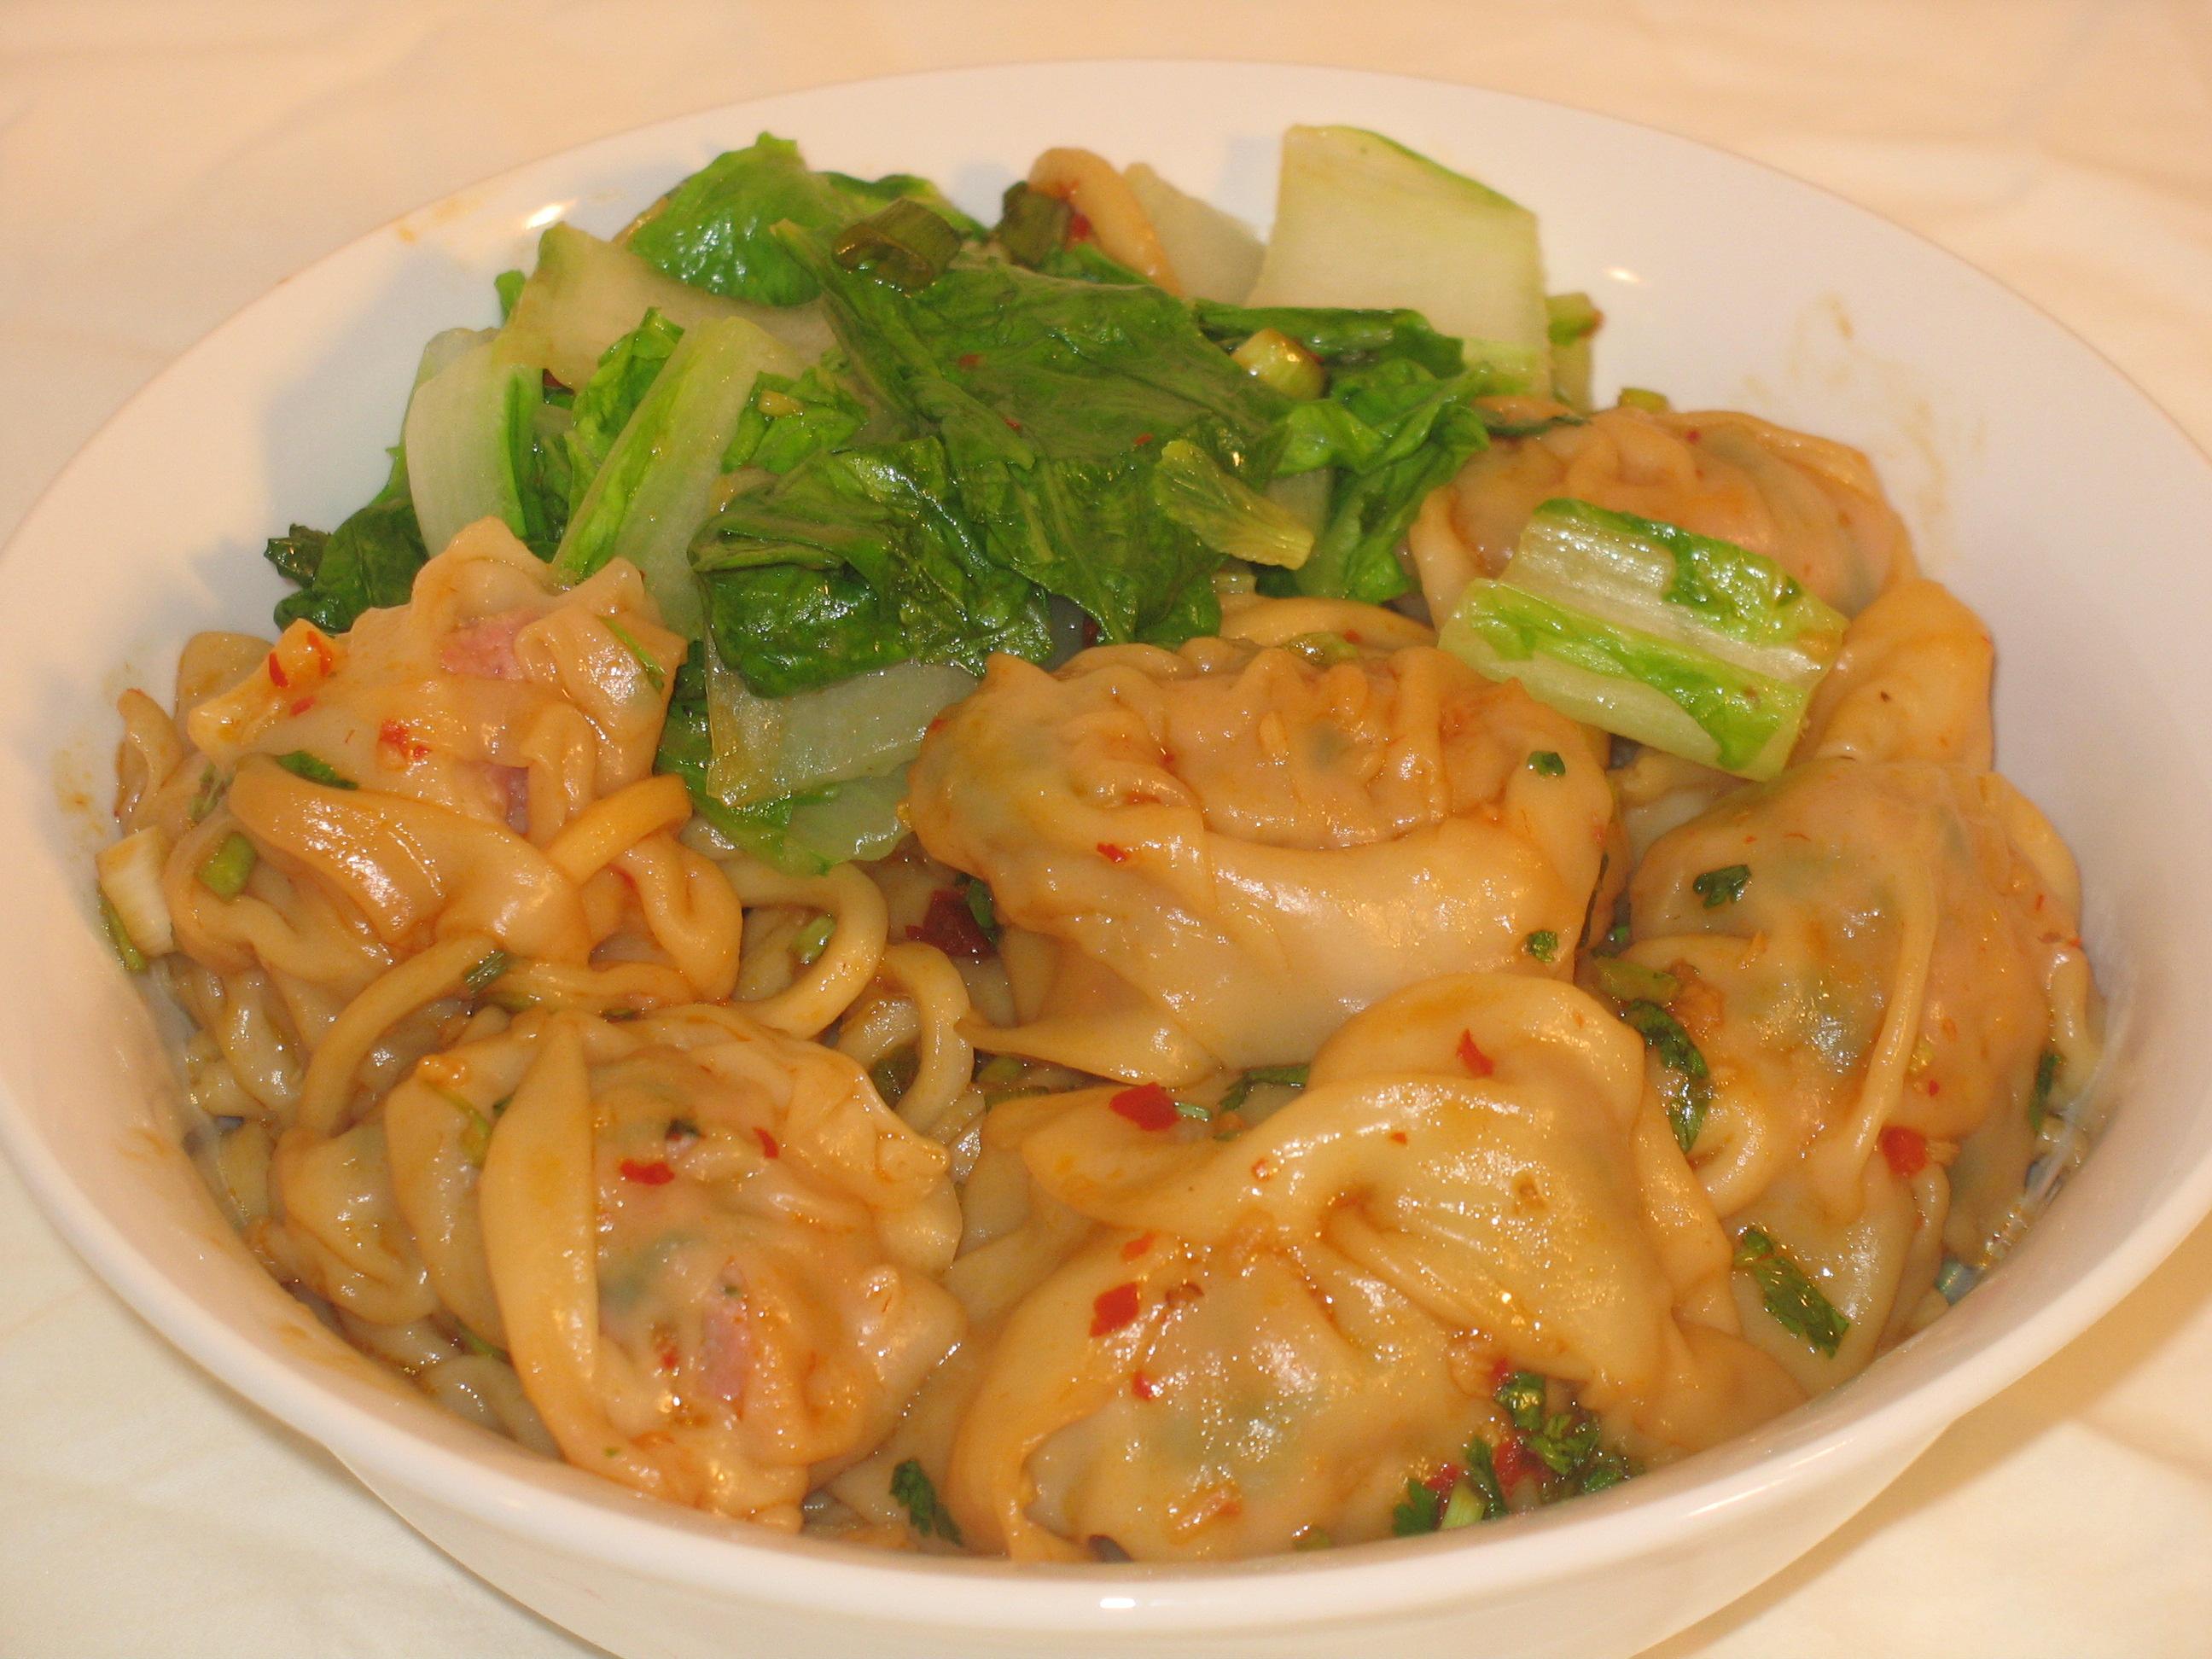 Spicy Dumpling Noodles